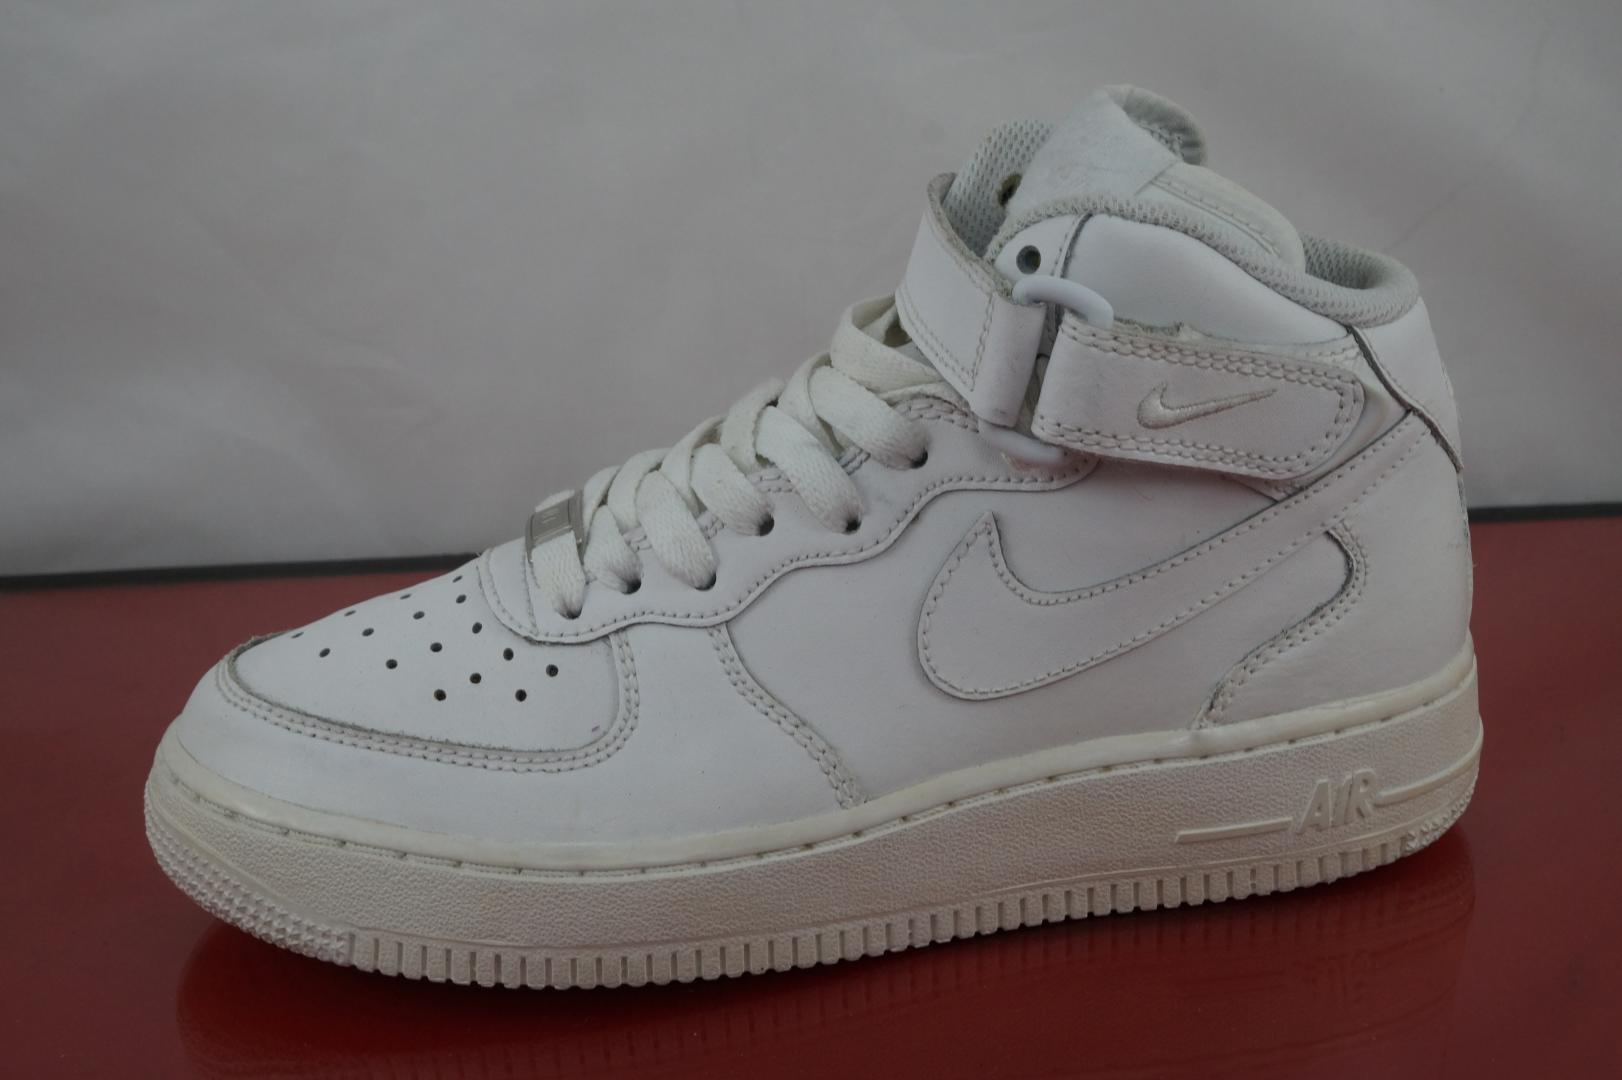 43aaeab7355aa2 1 Skóra 7233485381 Air W22 Force Buty Sportowe 5 R36 Nike q7IRRP